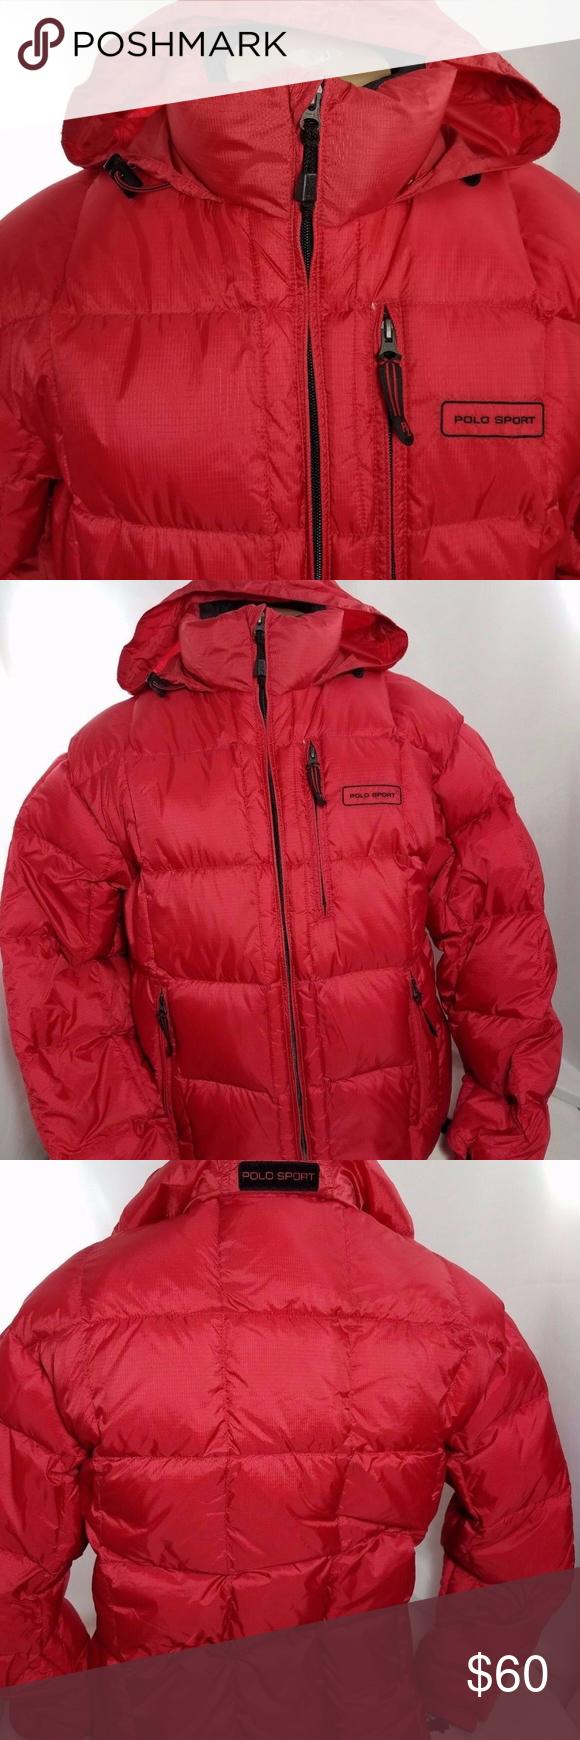 Polo Sport Ralph Lauren Coat Jacket Lined Hooded Polo Sport Ralph Lauren Ralph Lauren Winter Coats Jackets [ 1740 x 580 Pixel ]